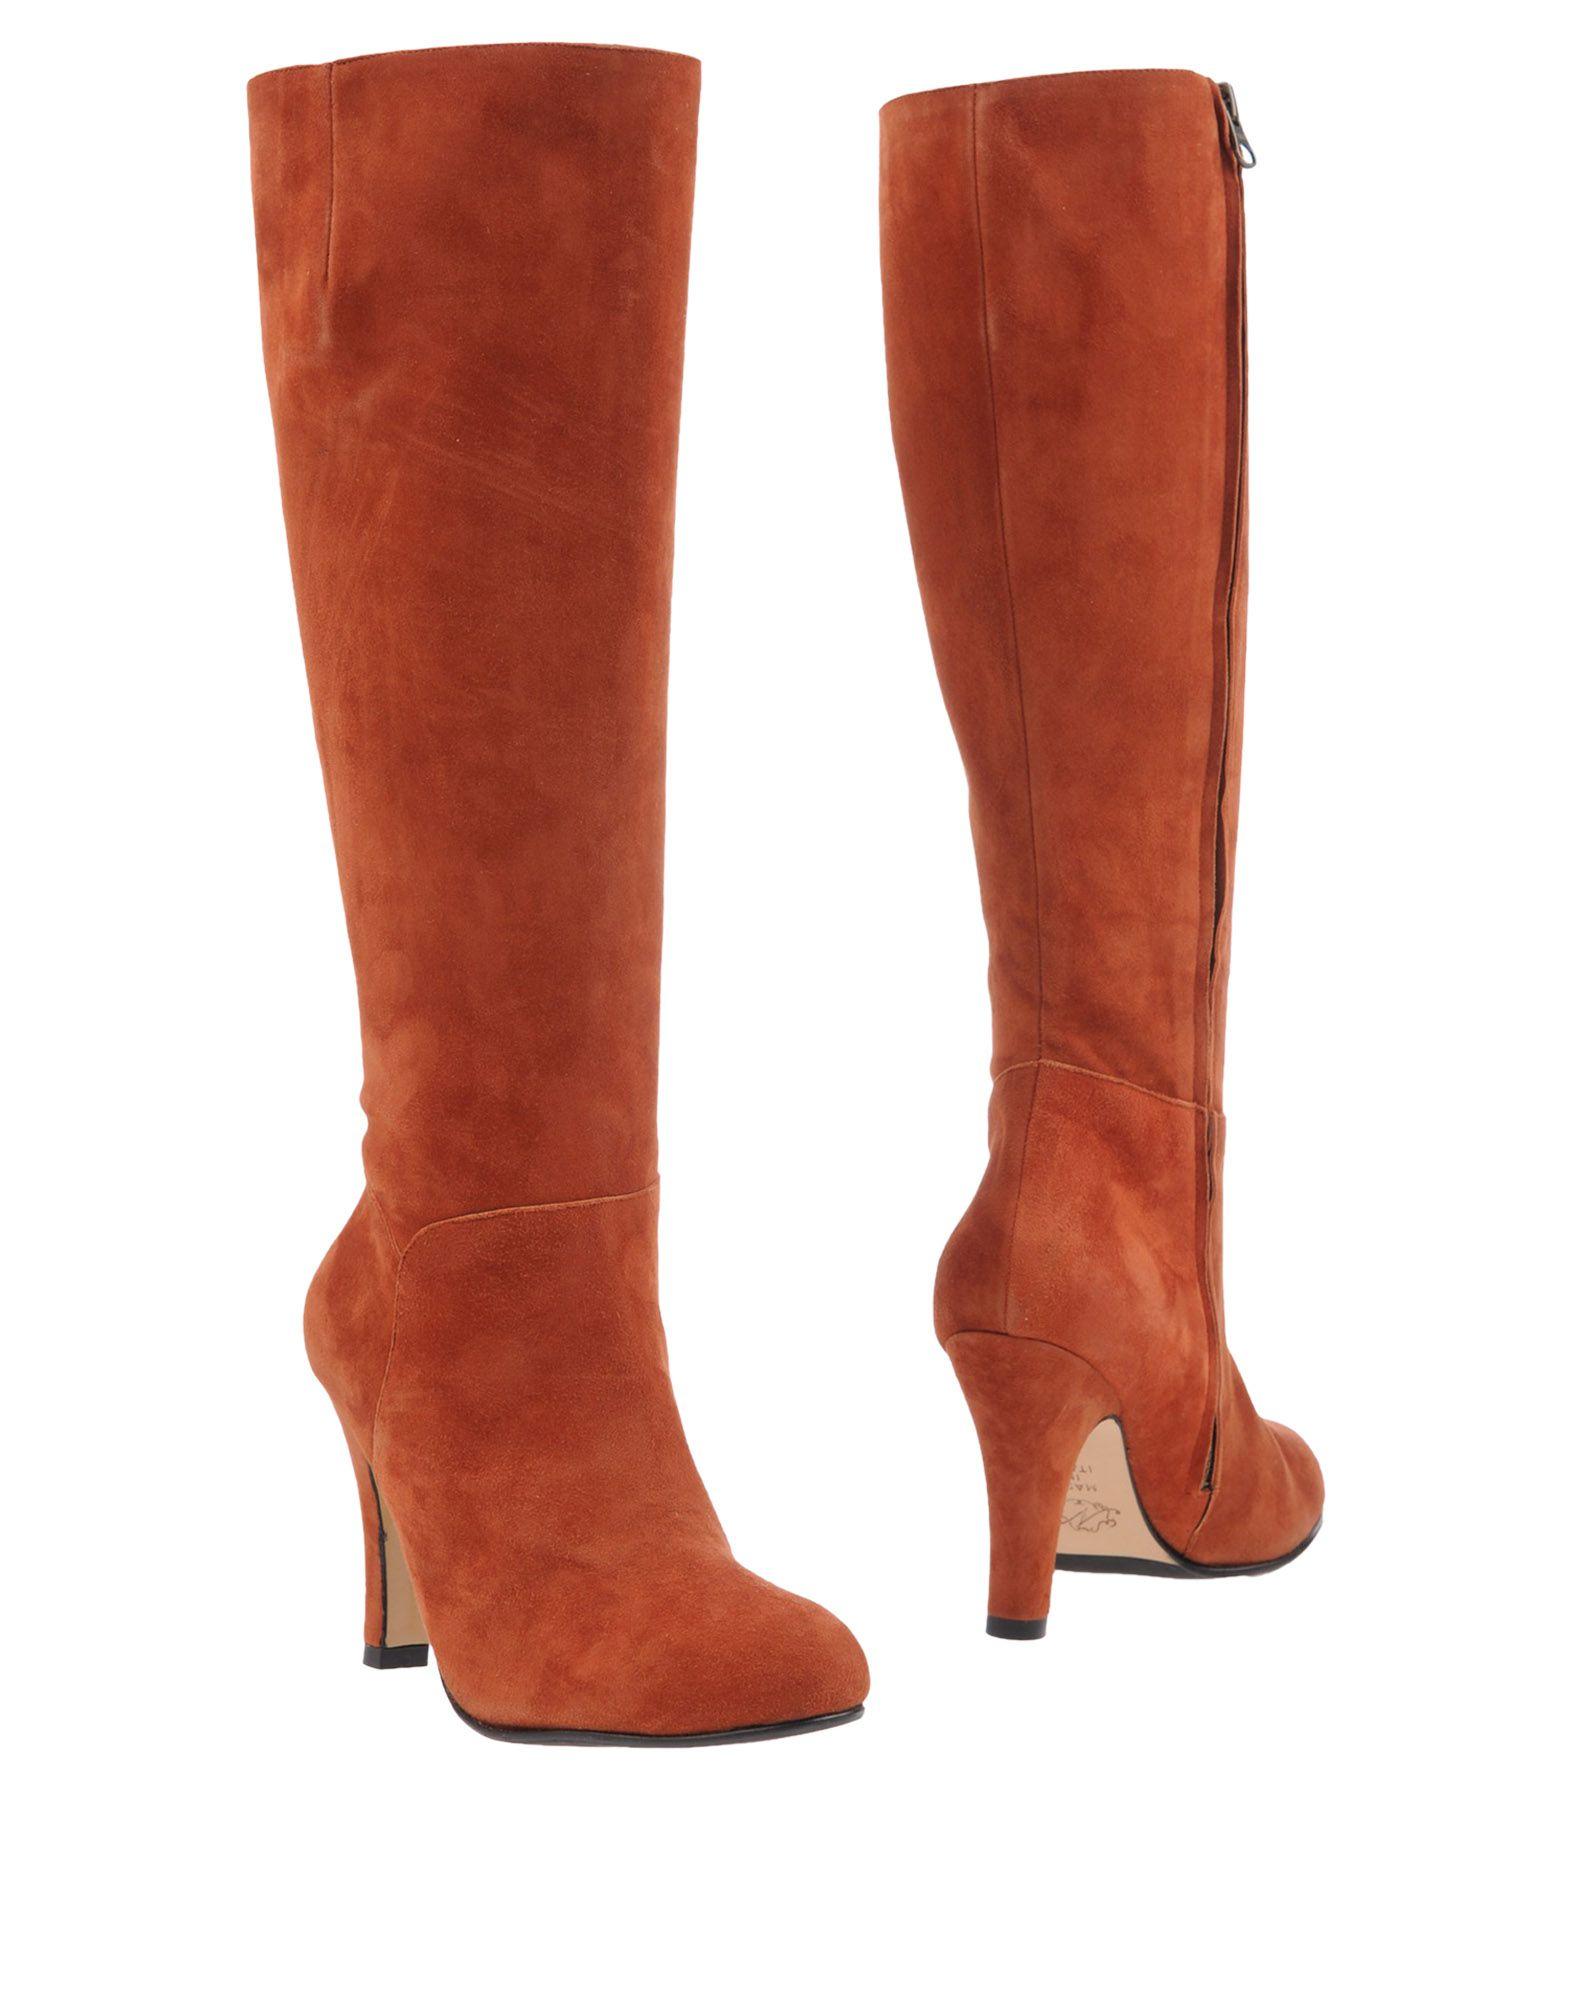 Lenora Stiefel  Damen  Stiefel 11226975NI Heiße Schuhe 15795e